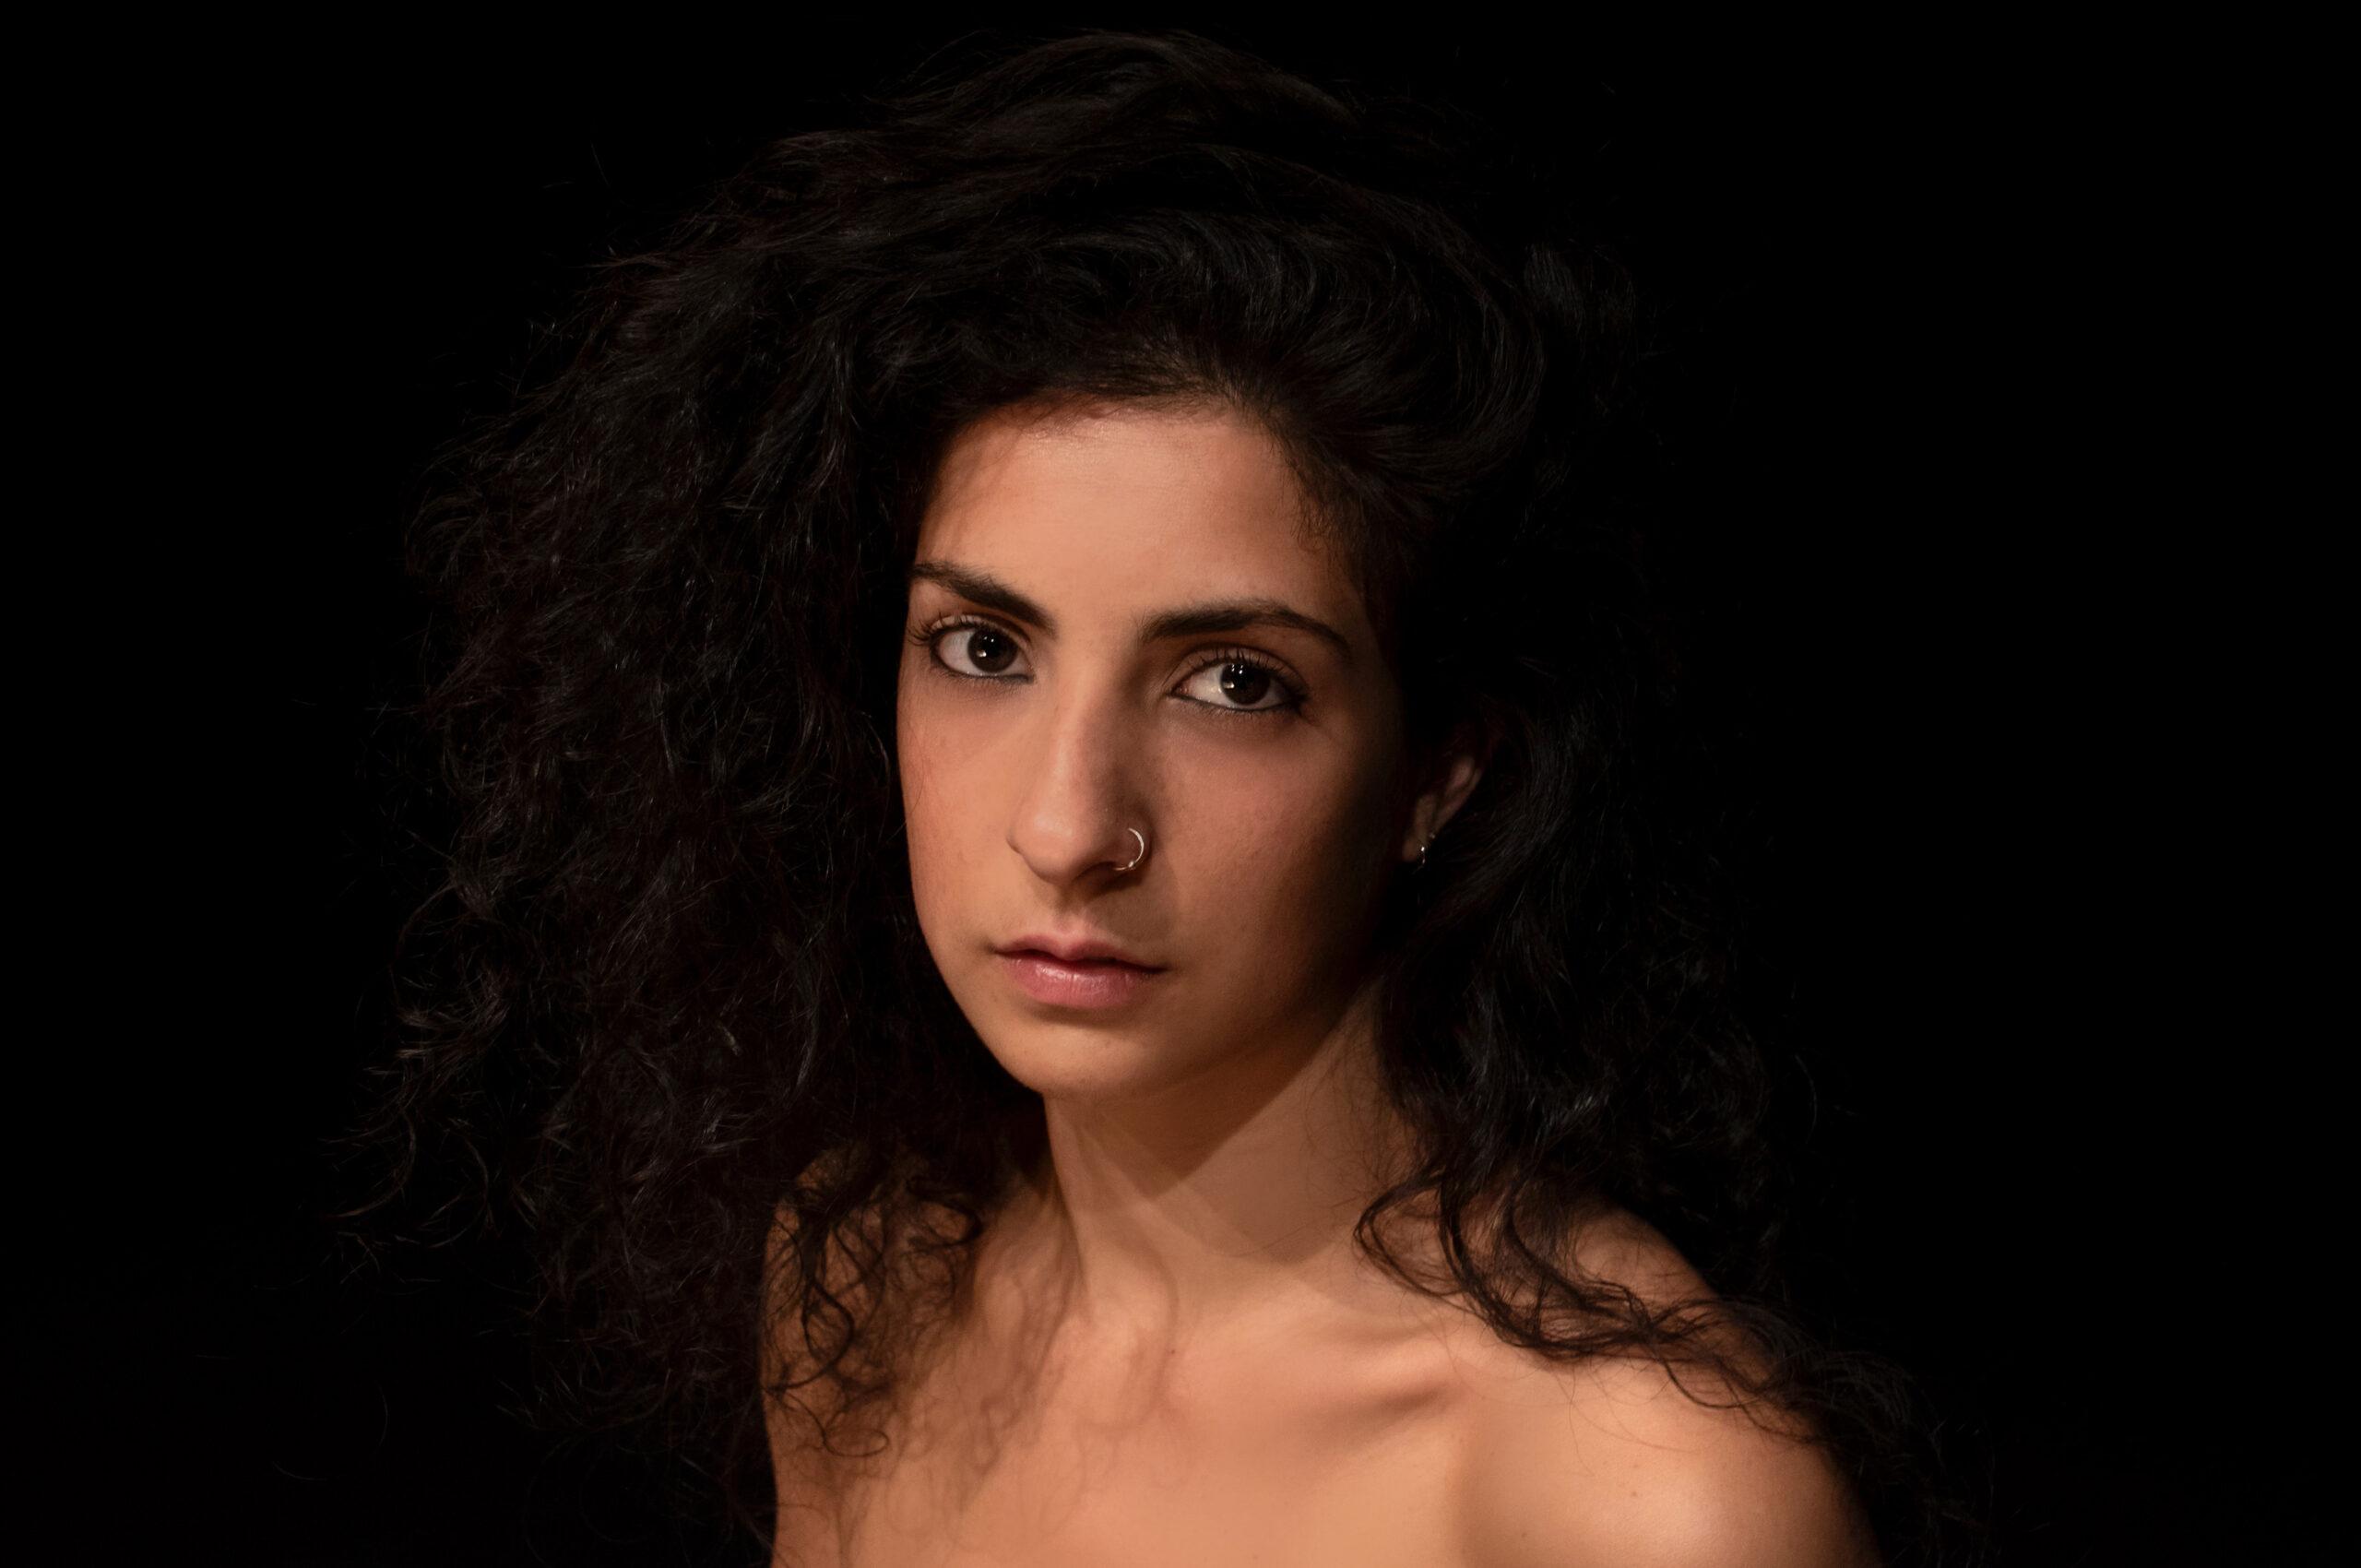 Francesca Lastella Lost Movement